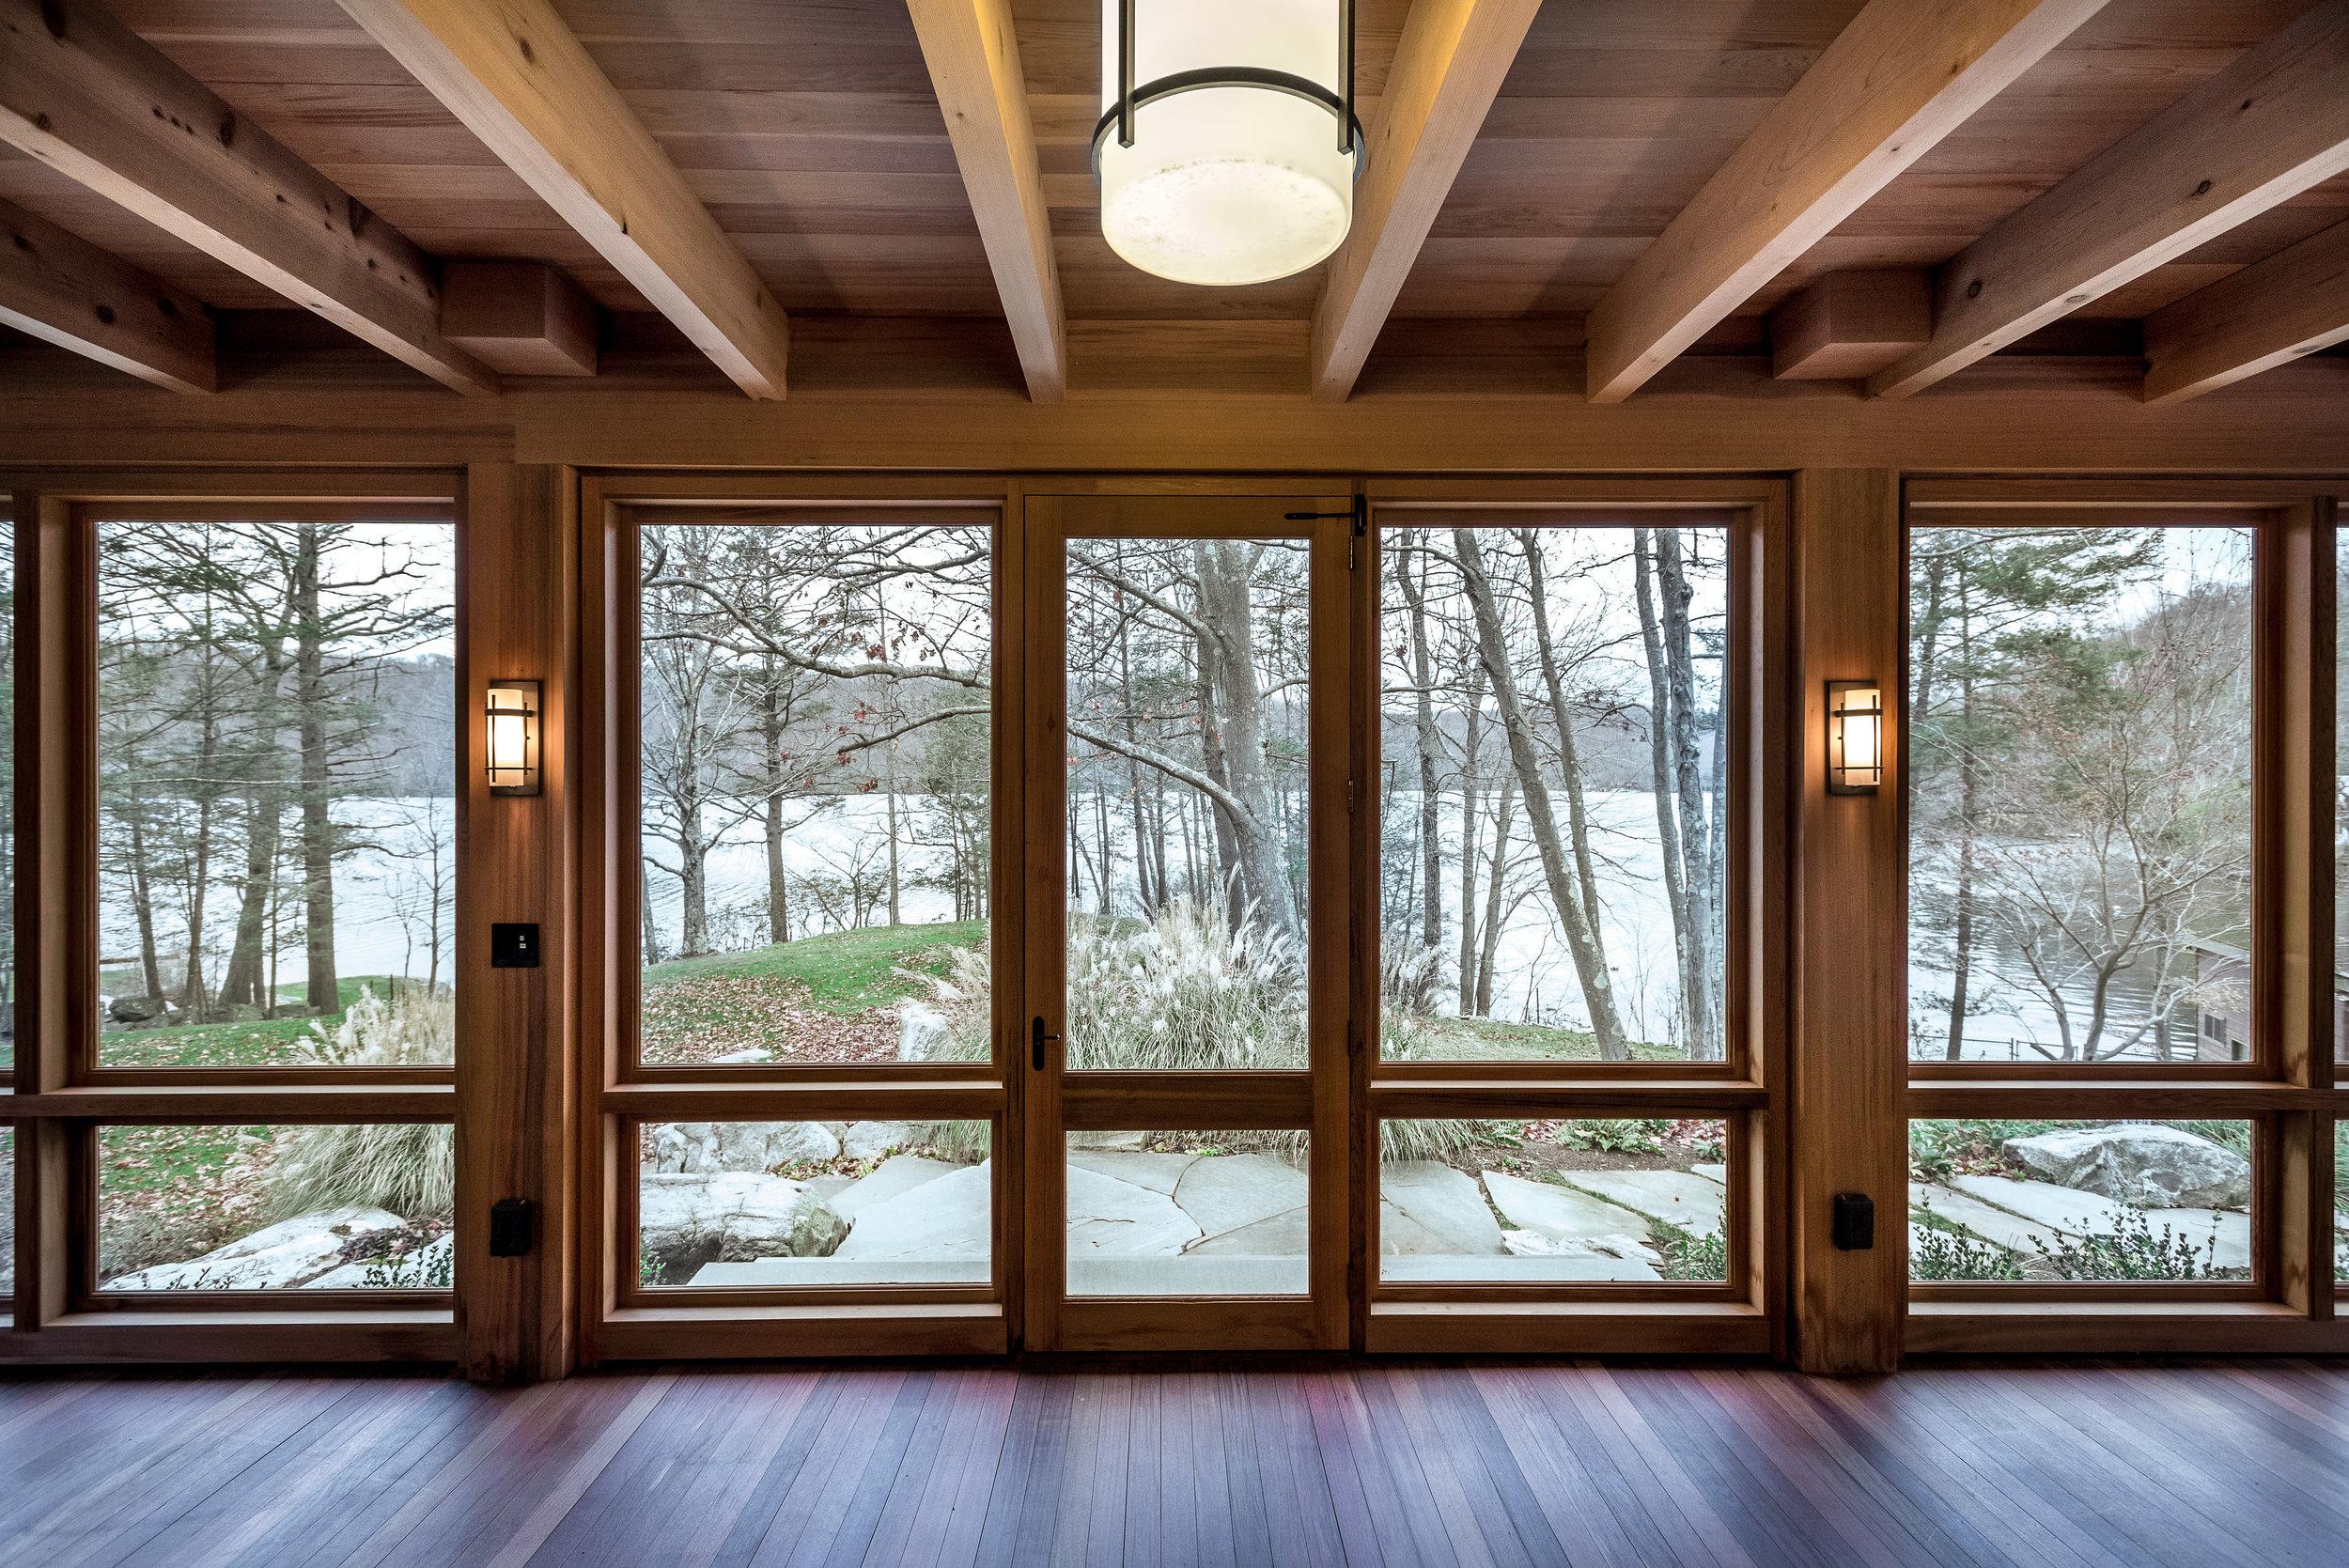 Home-Enrichment-Company-Pine-Timber-Frame-lake-House-102.jpg